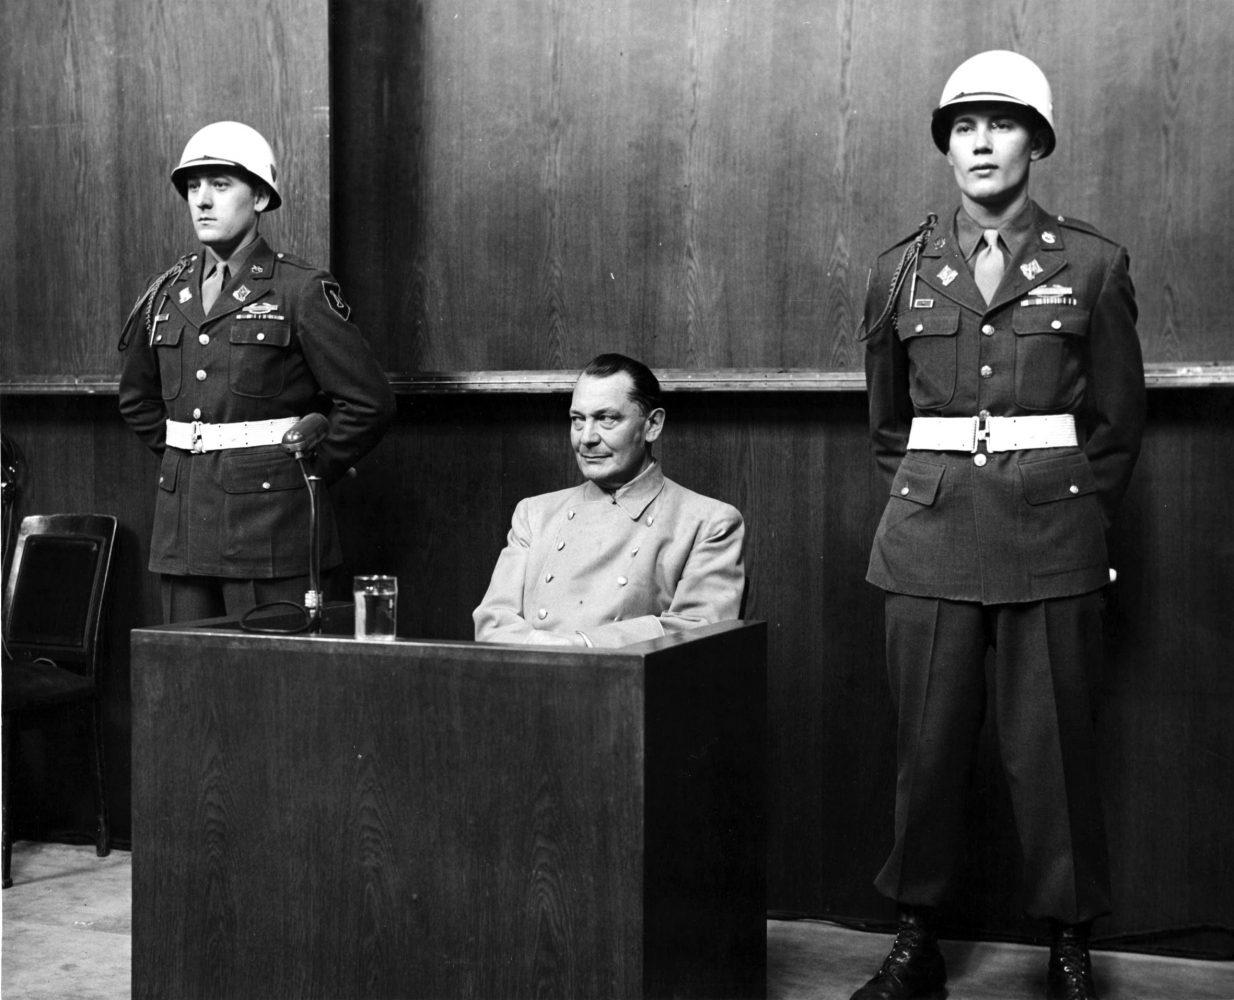 Nuremberg+Trials+1945-1949